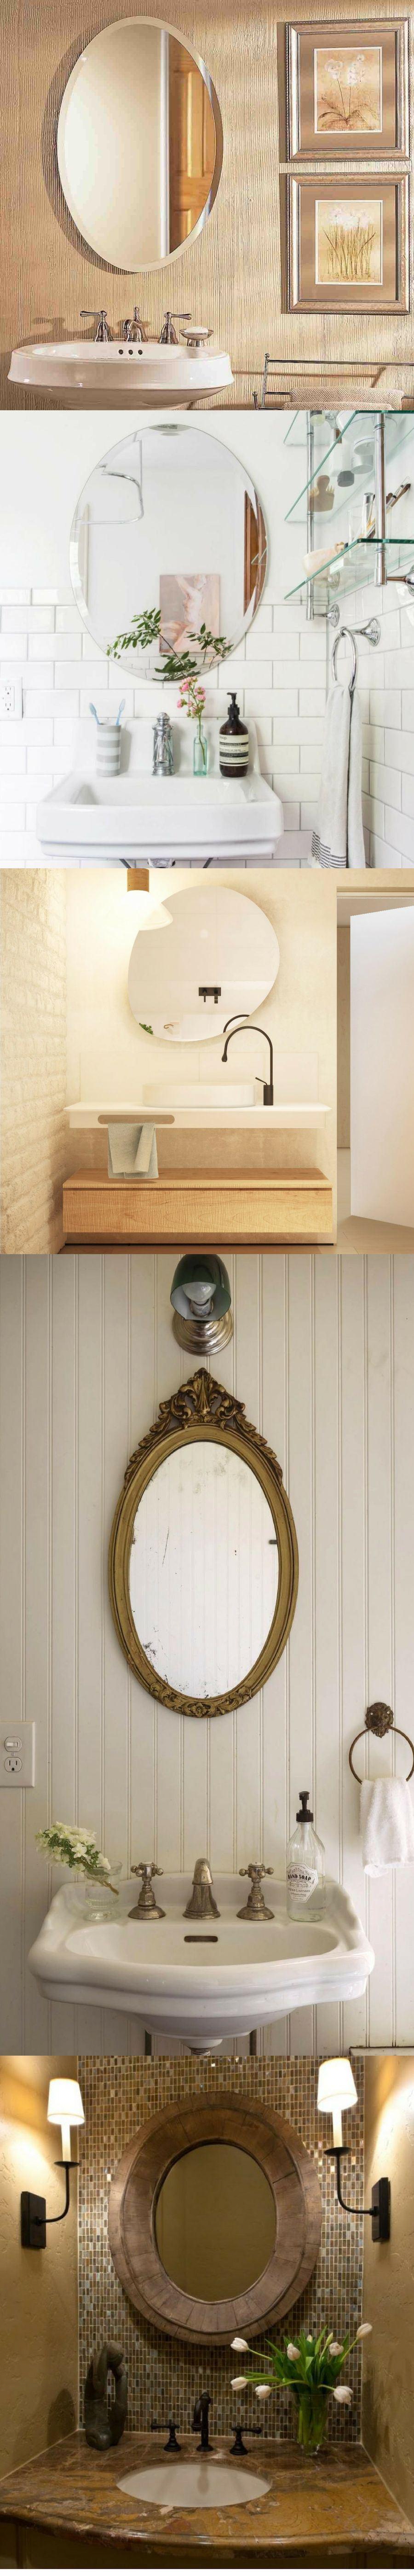 contemporary vanity mirrors for bathroom